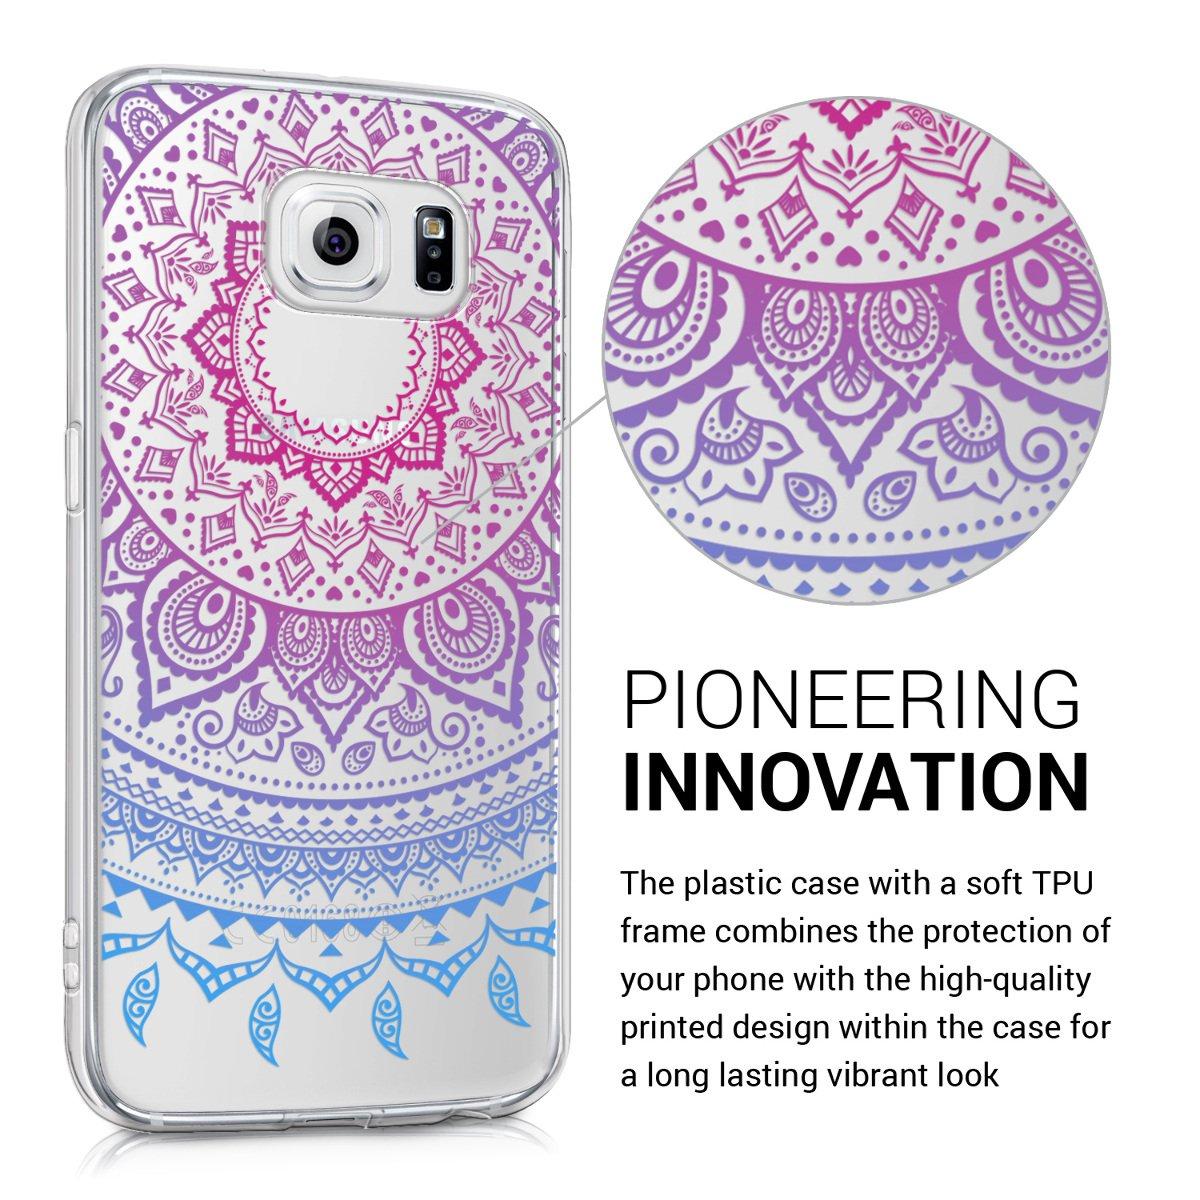 Plastik Mobe Phantastisch: Iphone